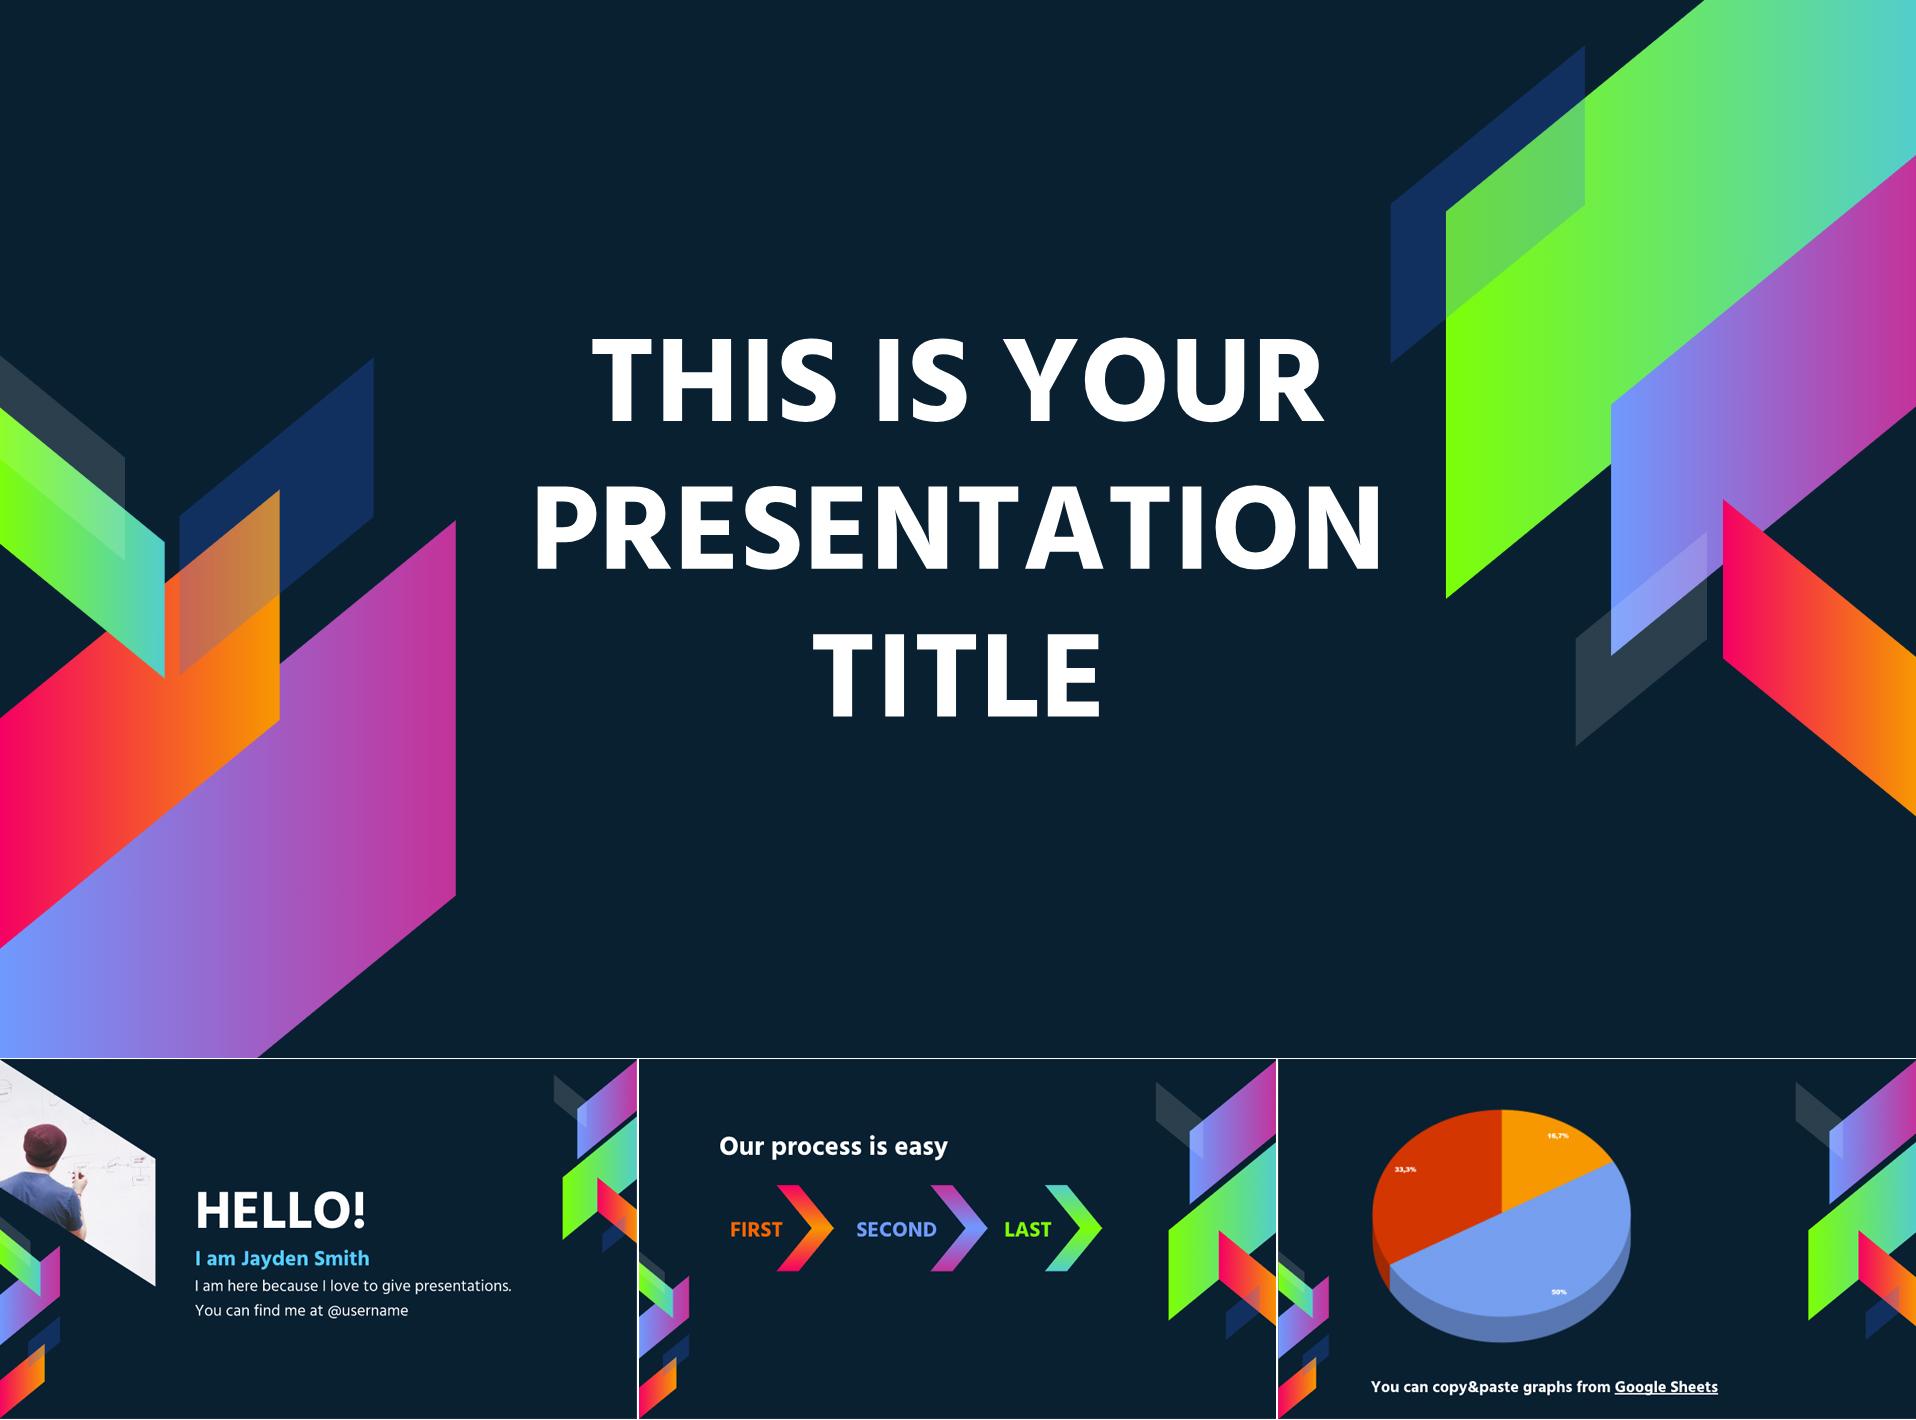 Neon Theme Free Google Slides Templates - The Internet Tips